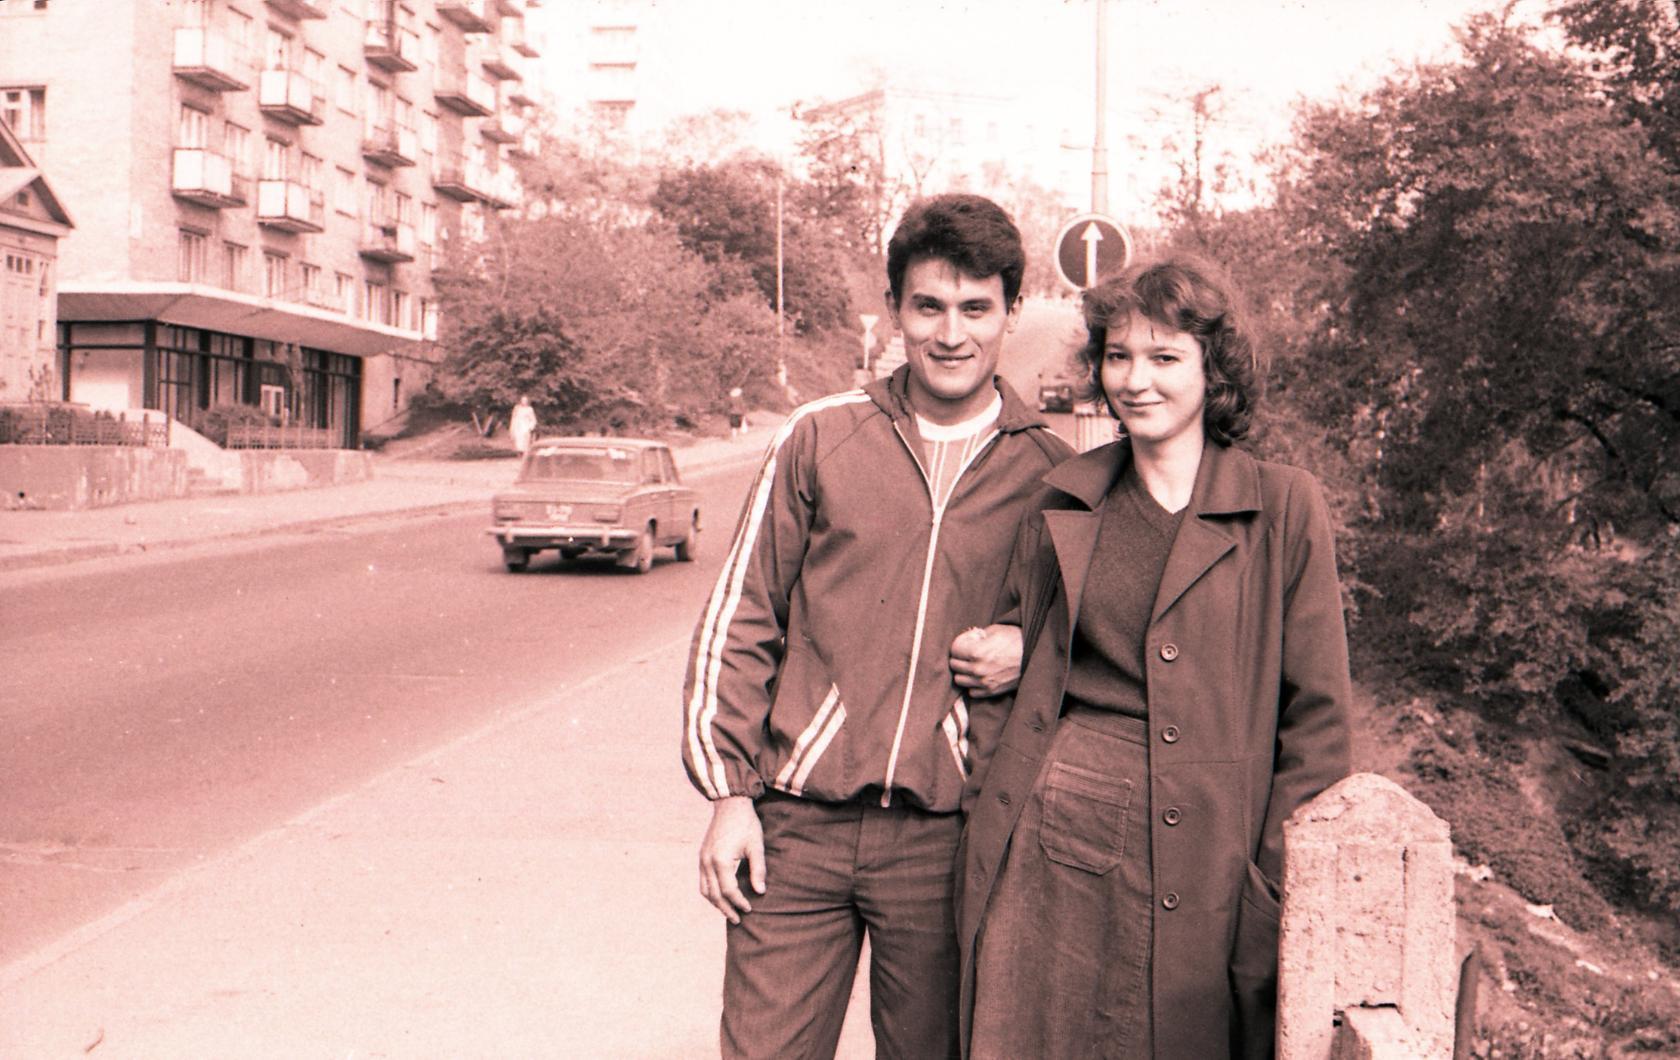 Секс с узбеками во владивостоке 13 фотография